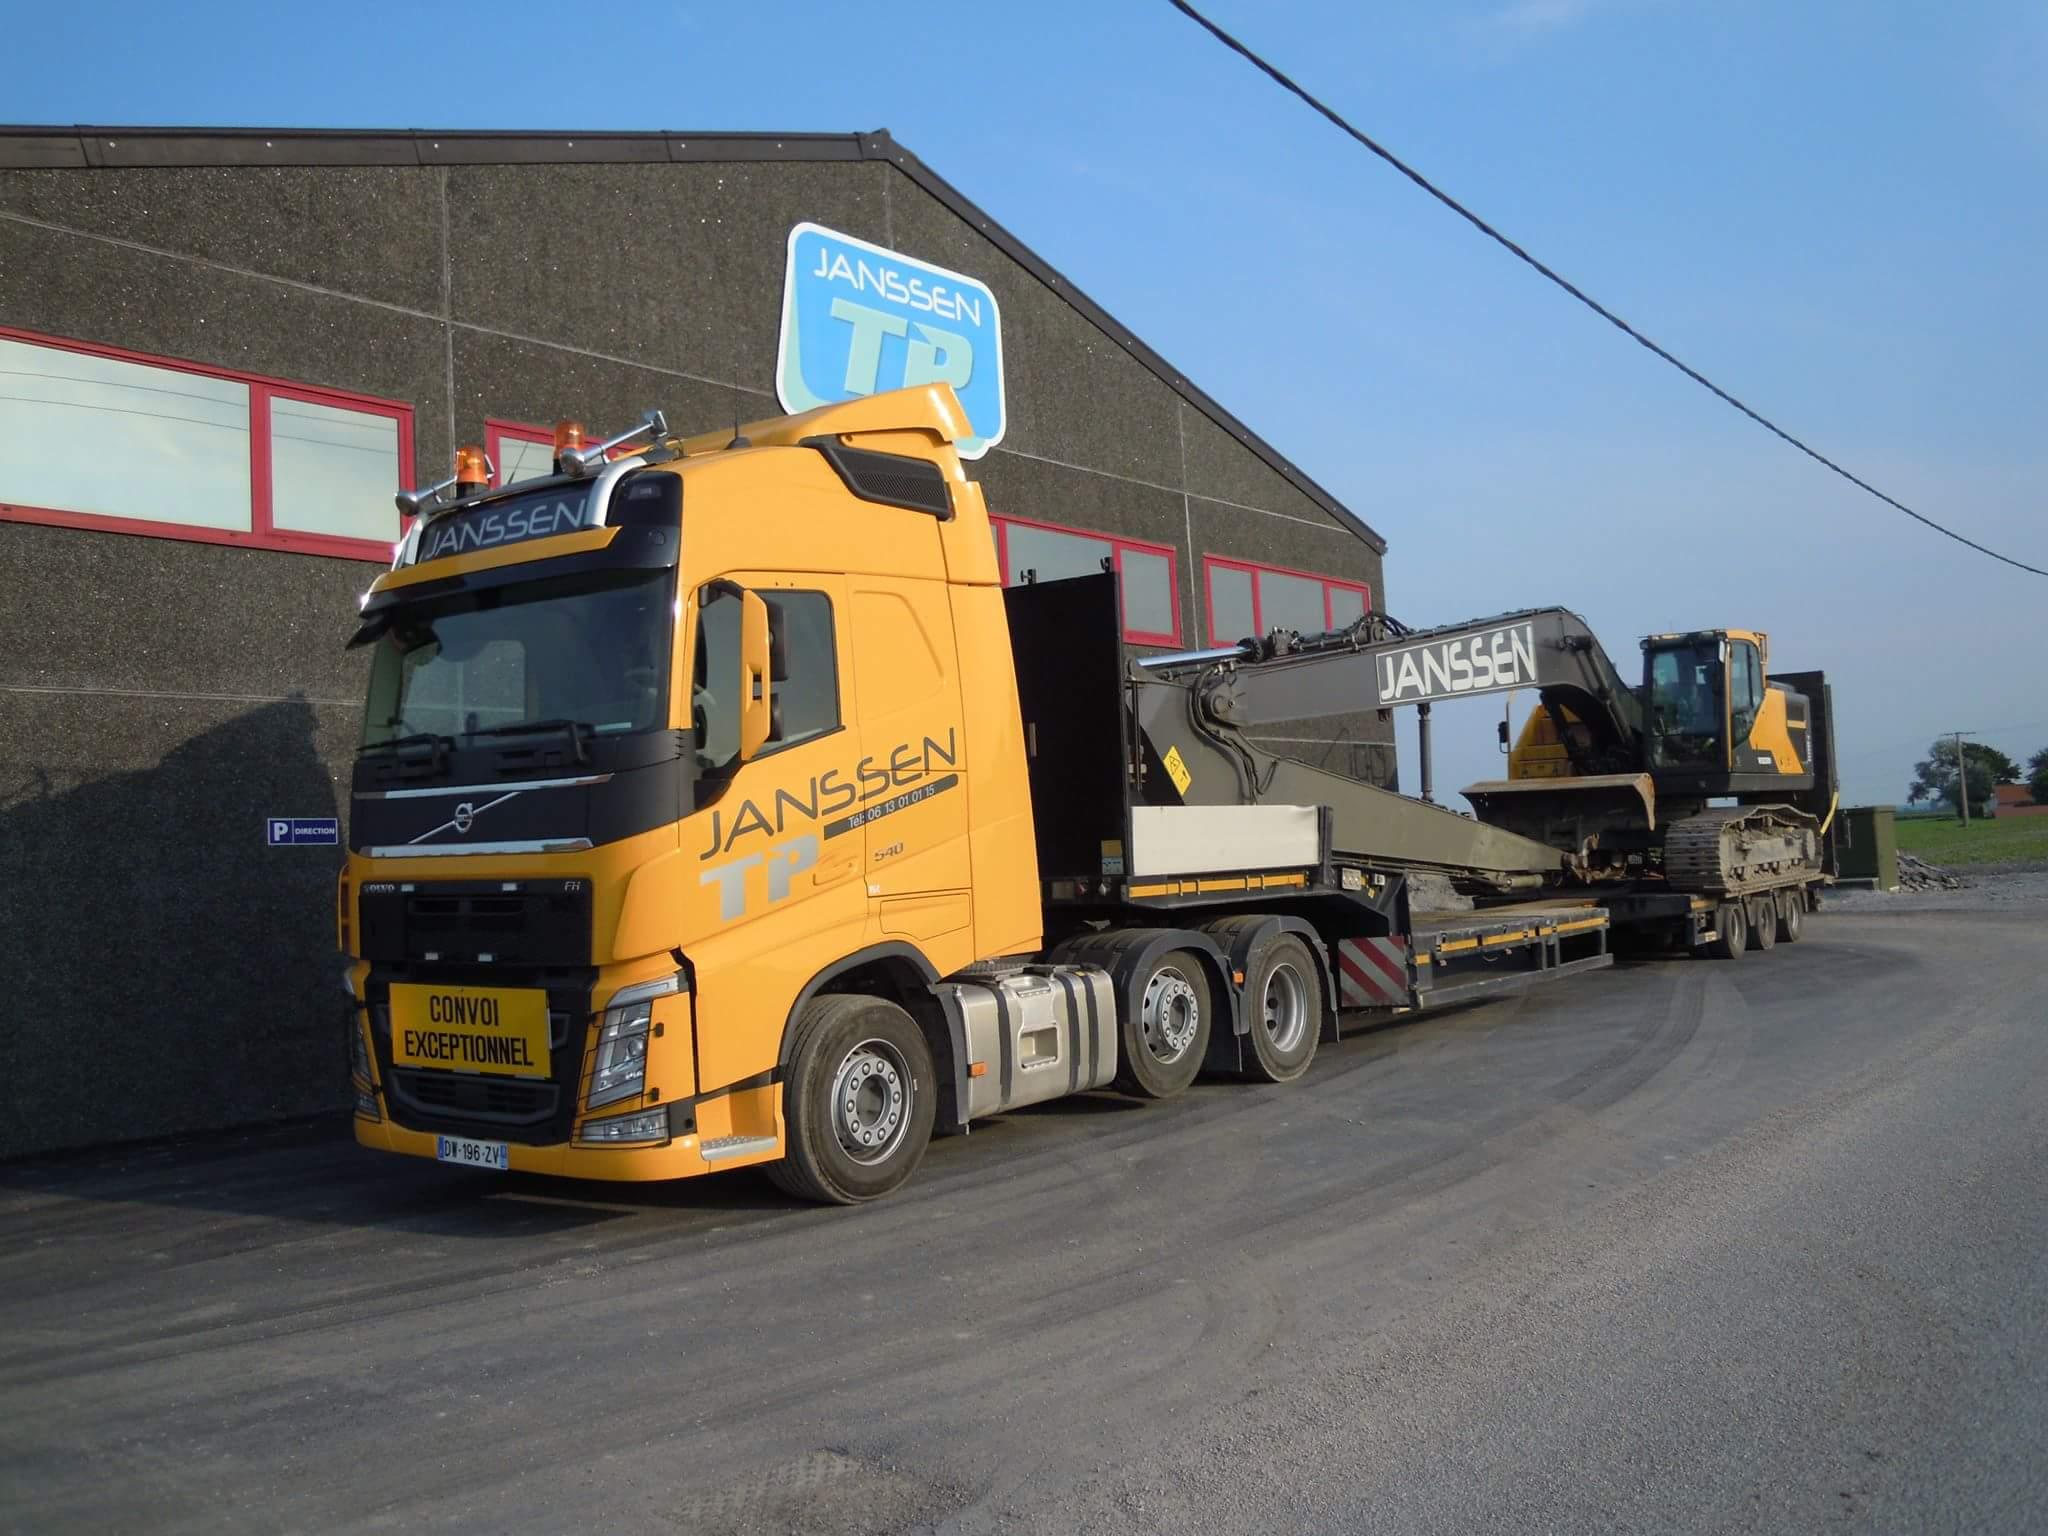 Transport - Convoi exceptionnel